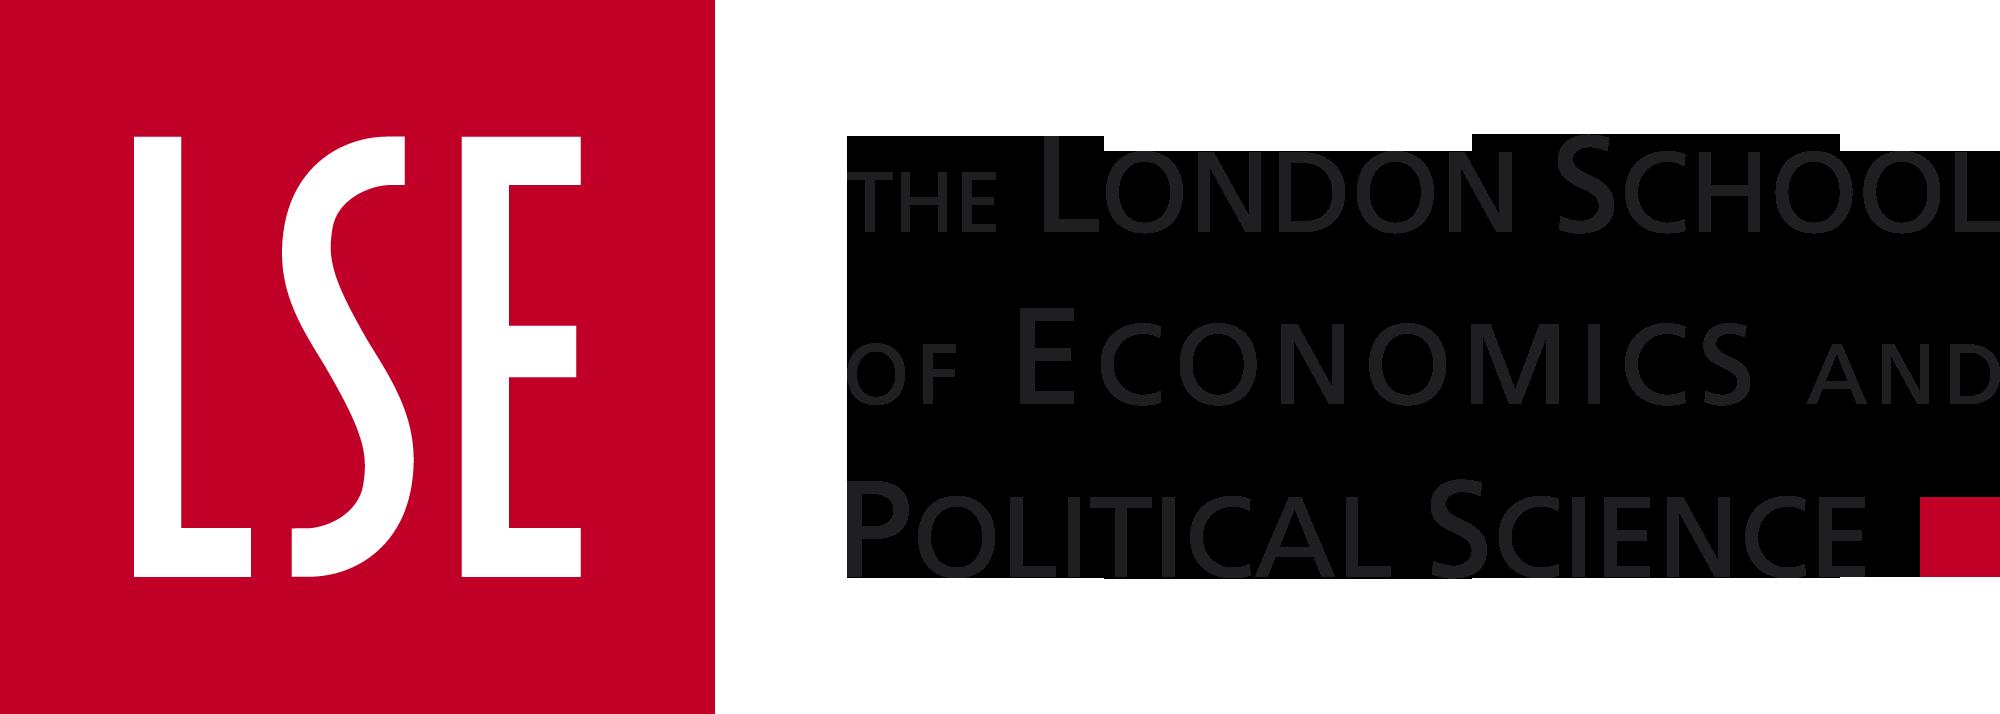 LOGO_london-school-economics.png